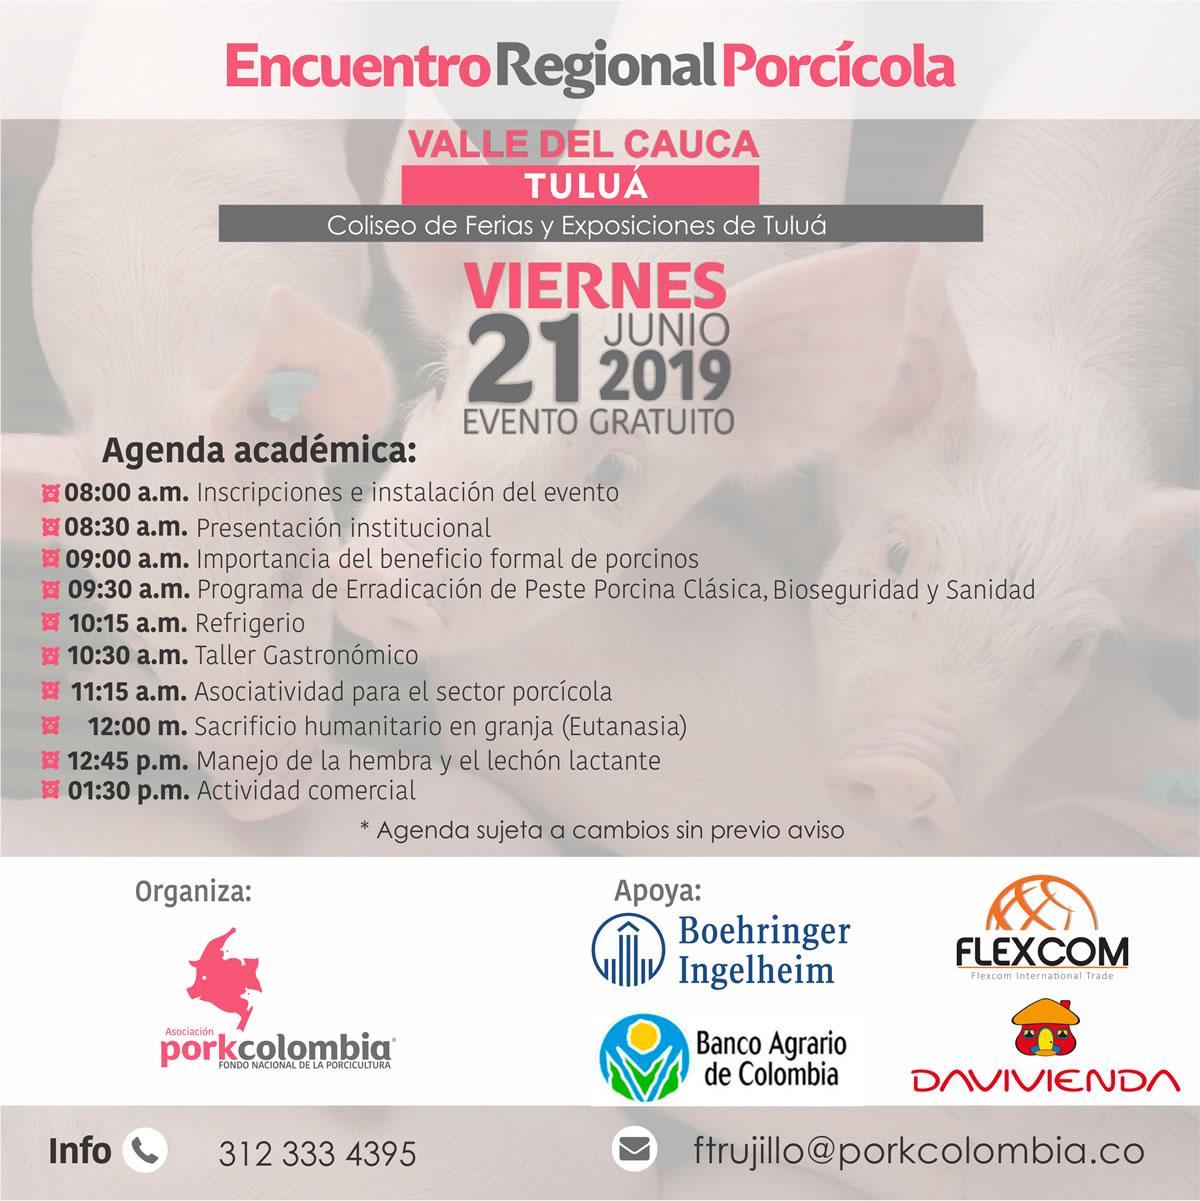 https://www.porkcolombia.co/wp-content/uploads/2019/06/Agenda_21dejunio_tulua.jpg